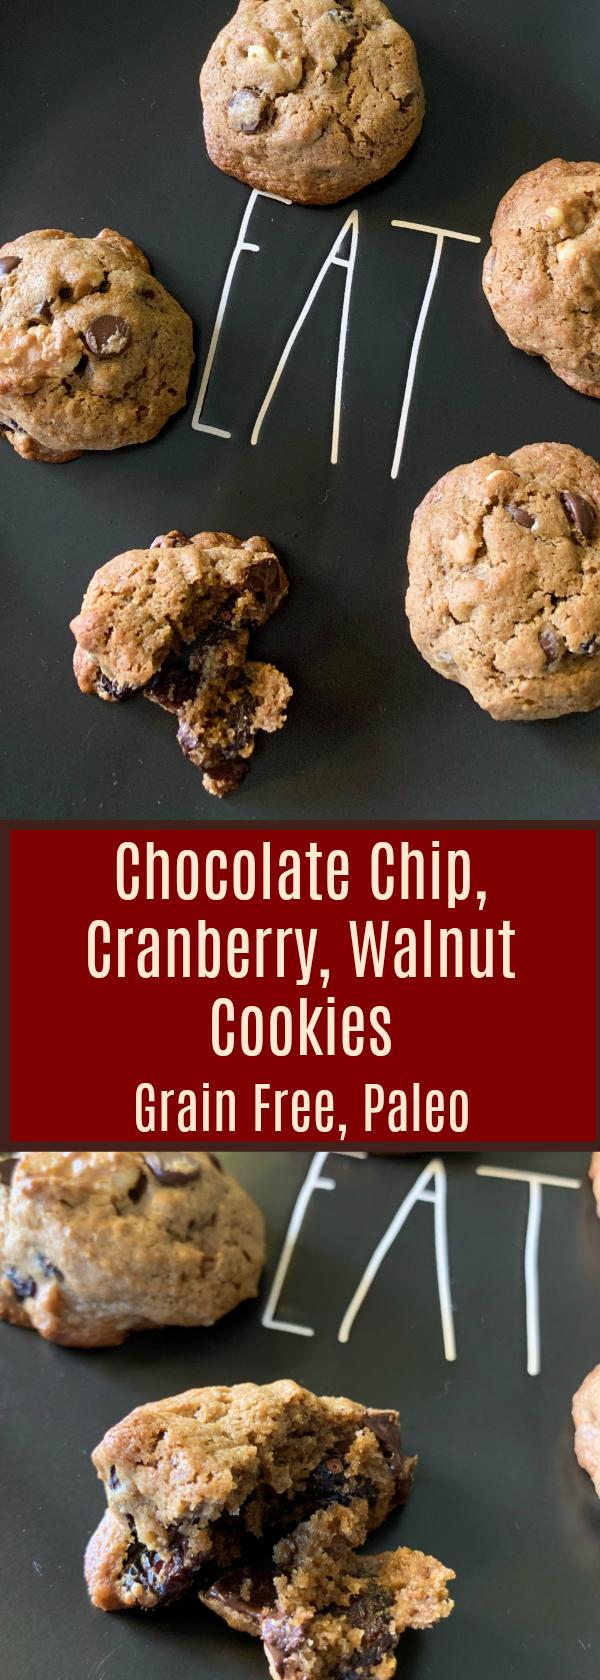 Chocolate Chip, Cranberry, Walnut Grain Free Cookies, Dairy Free, Paleo, Gluten Free